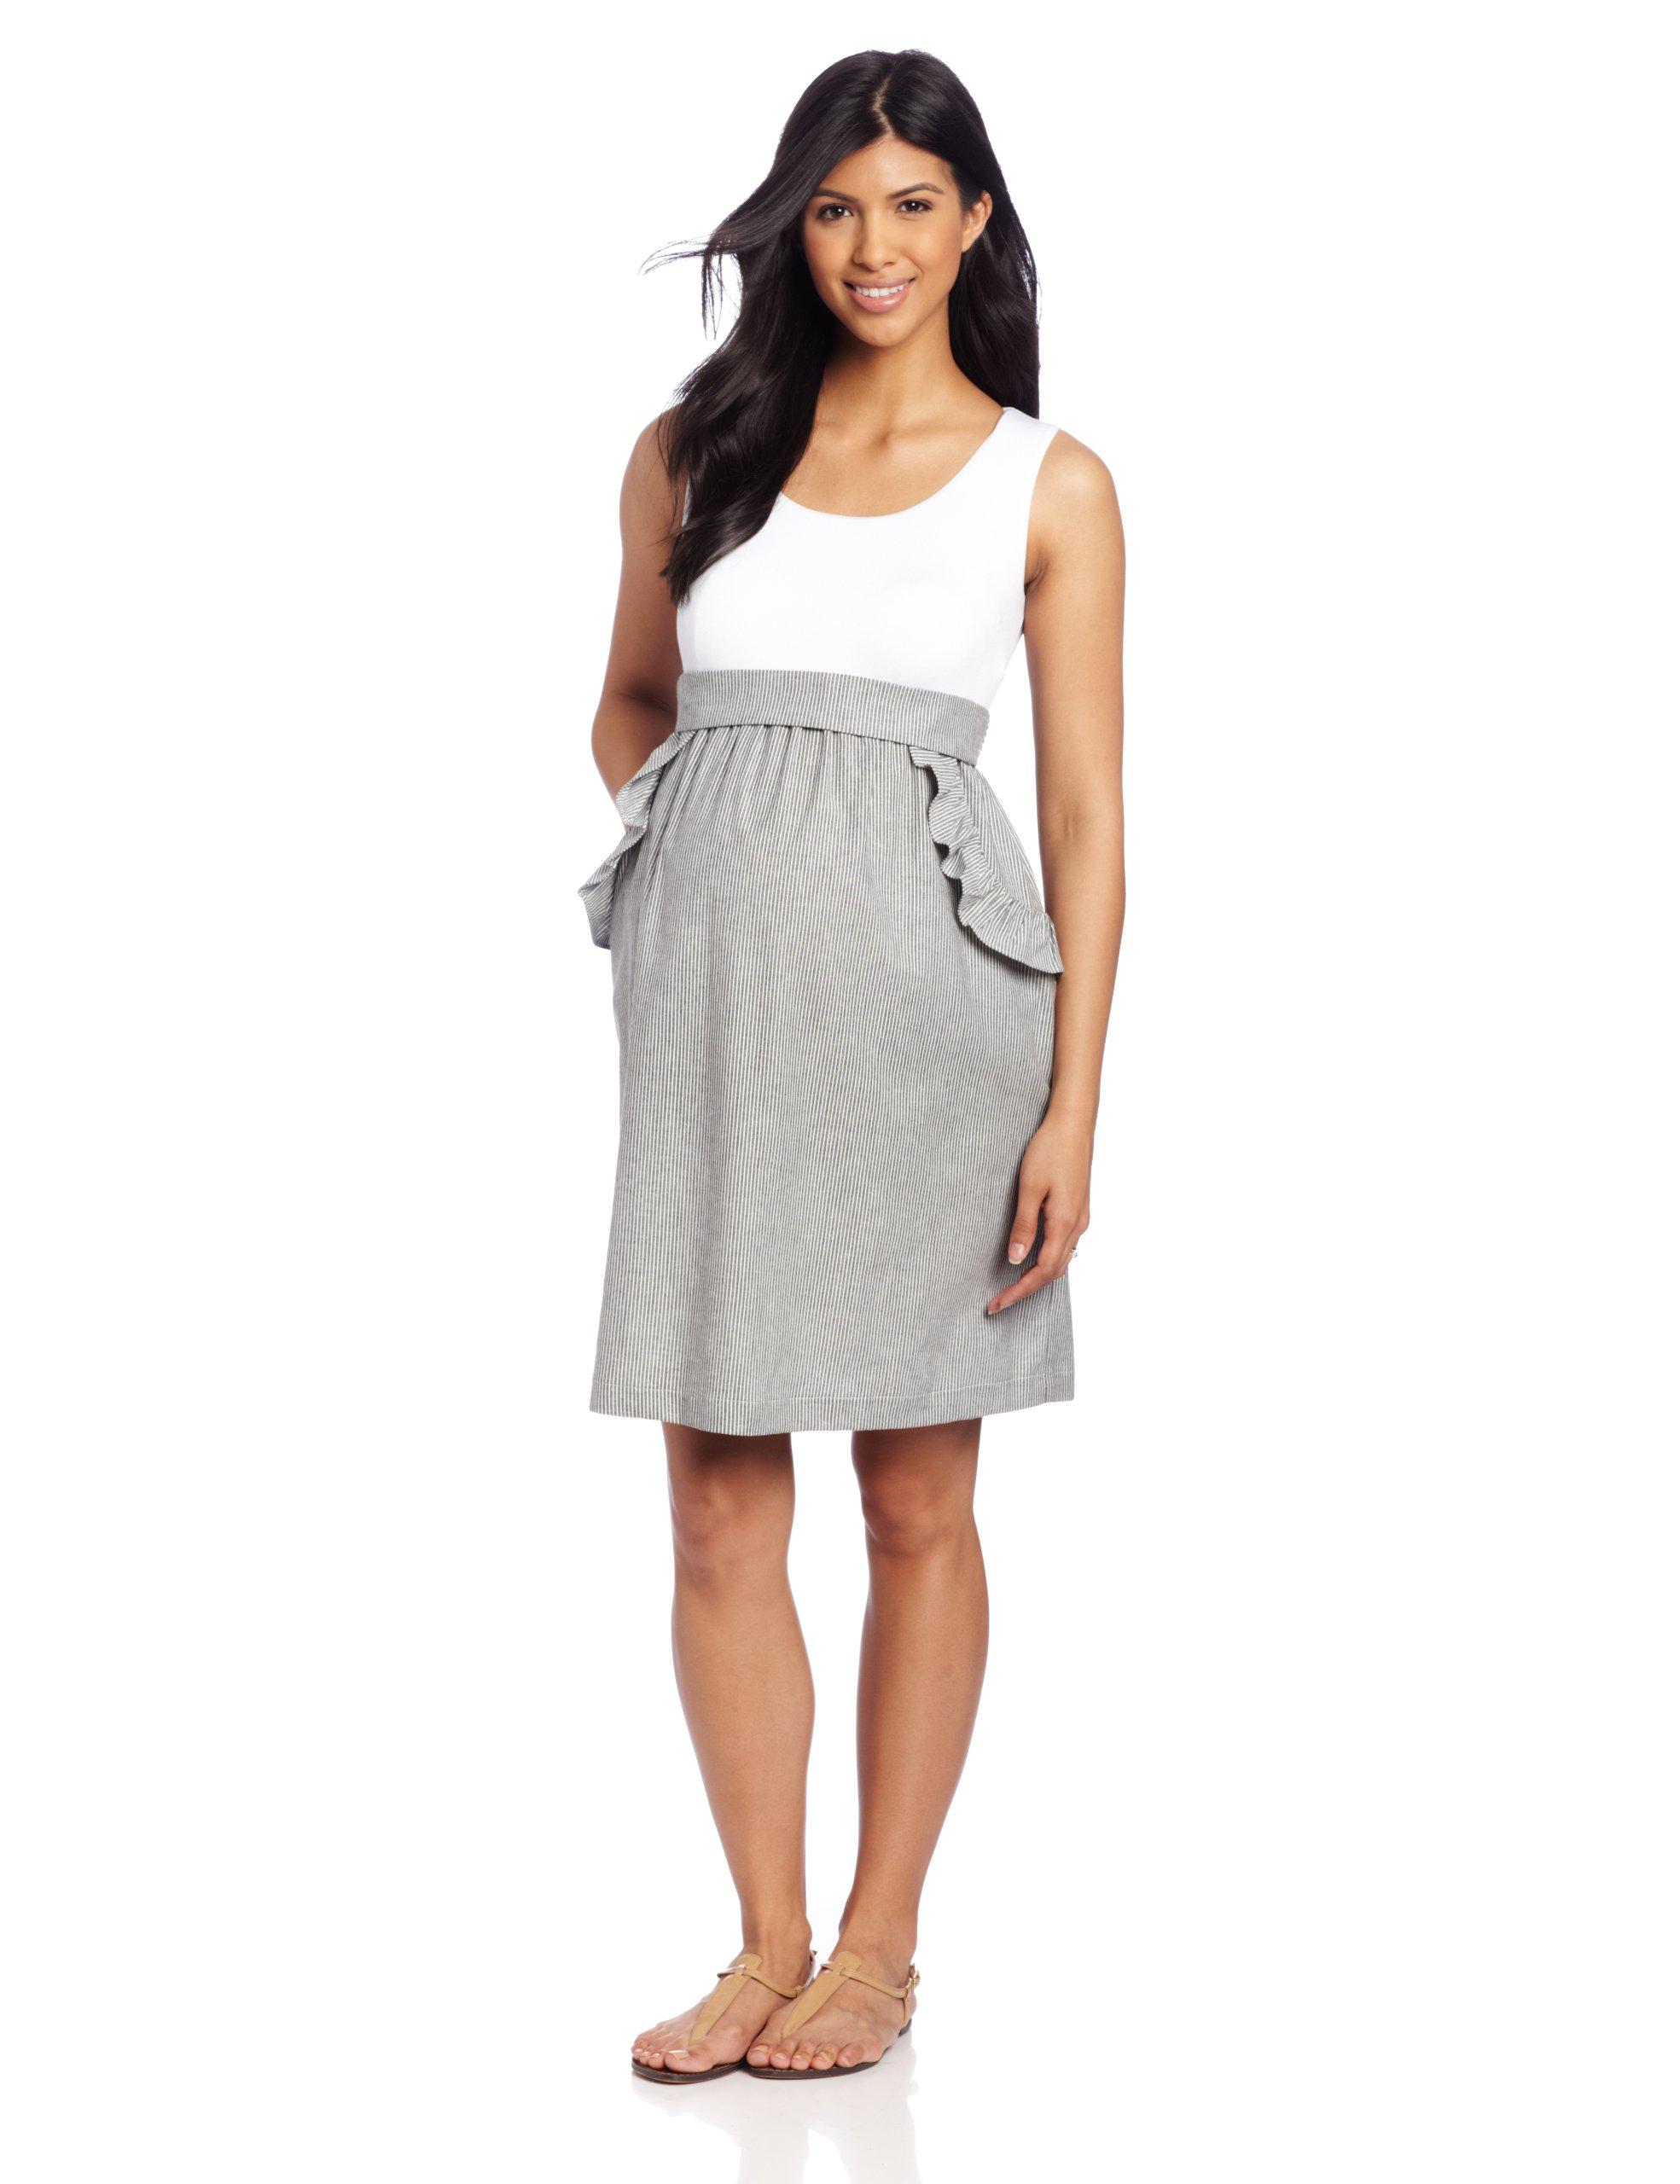 Maternal America Women's Maternity Ruffle Pocket Dress, White/Black Seersucker, Small